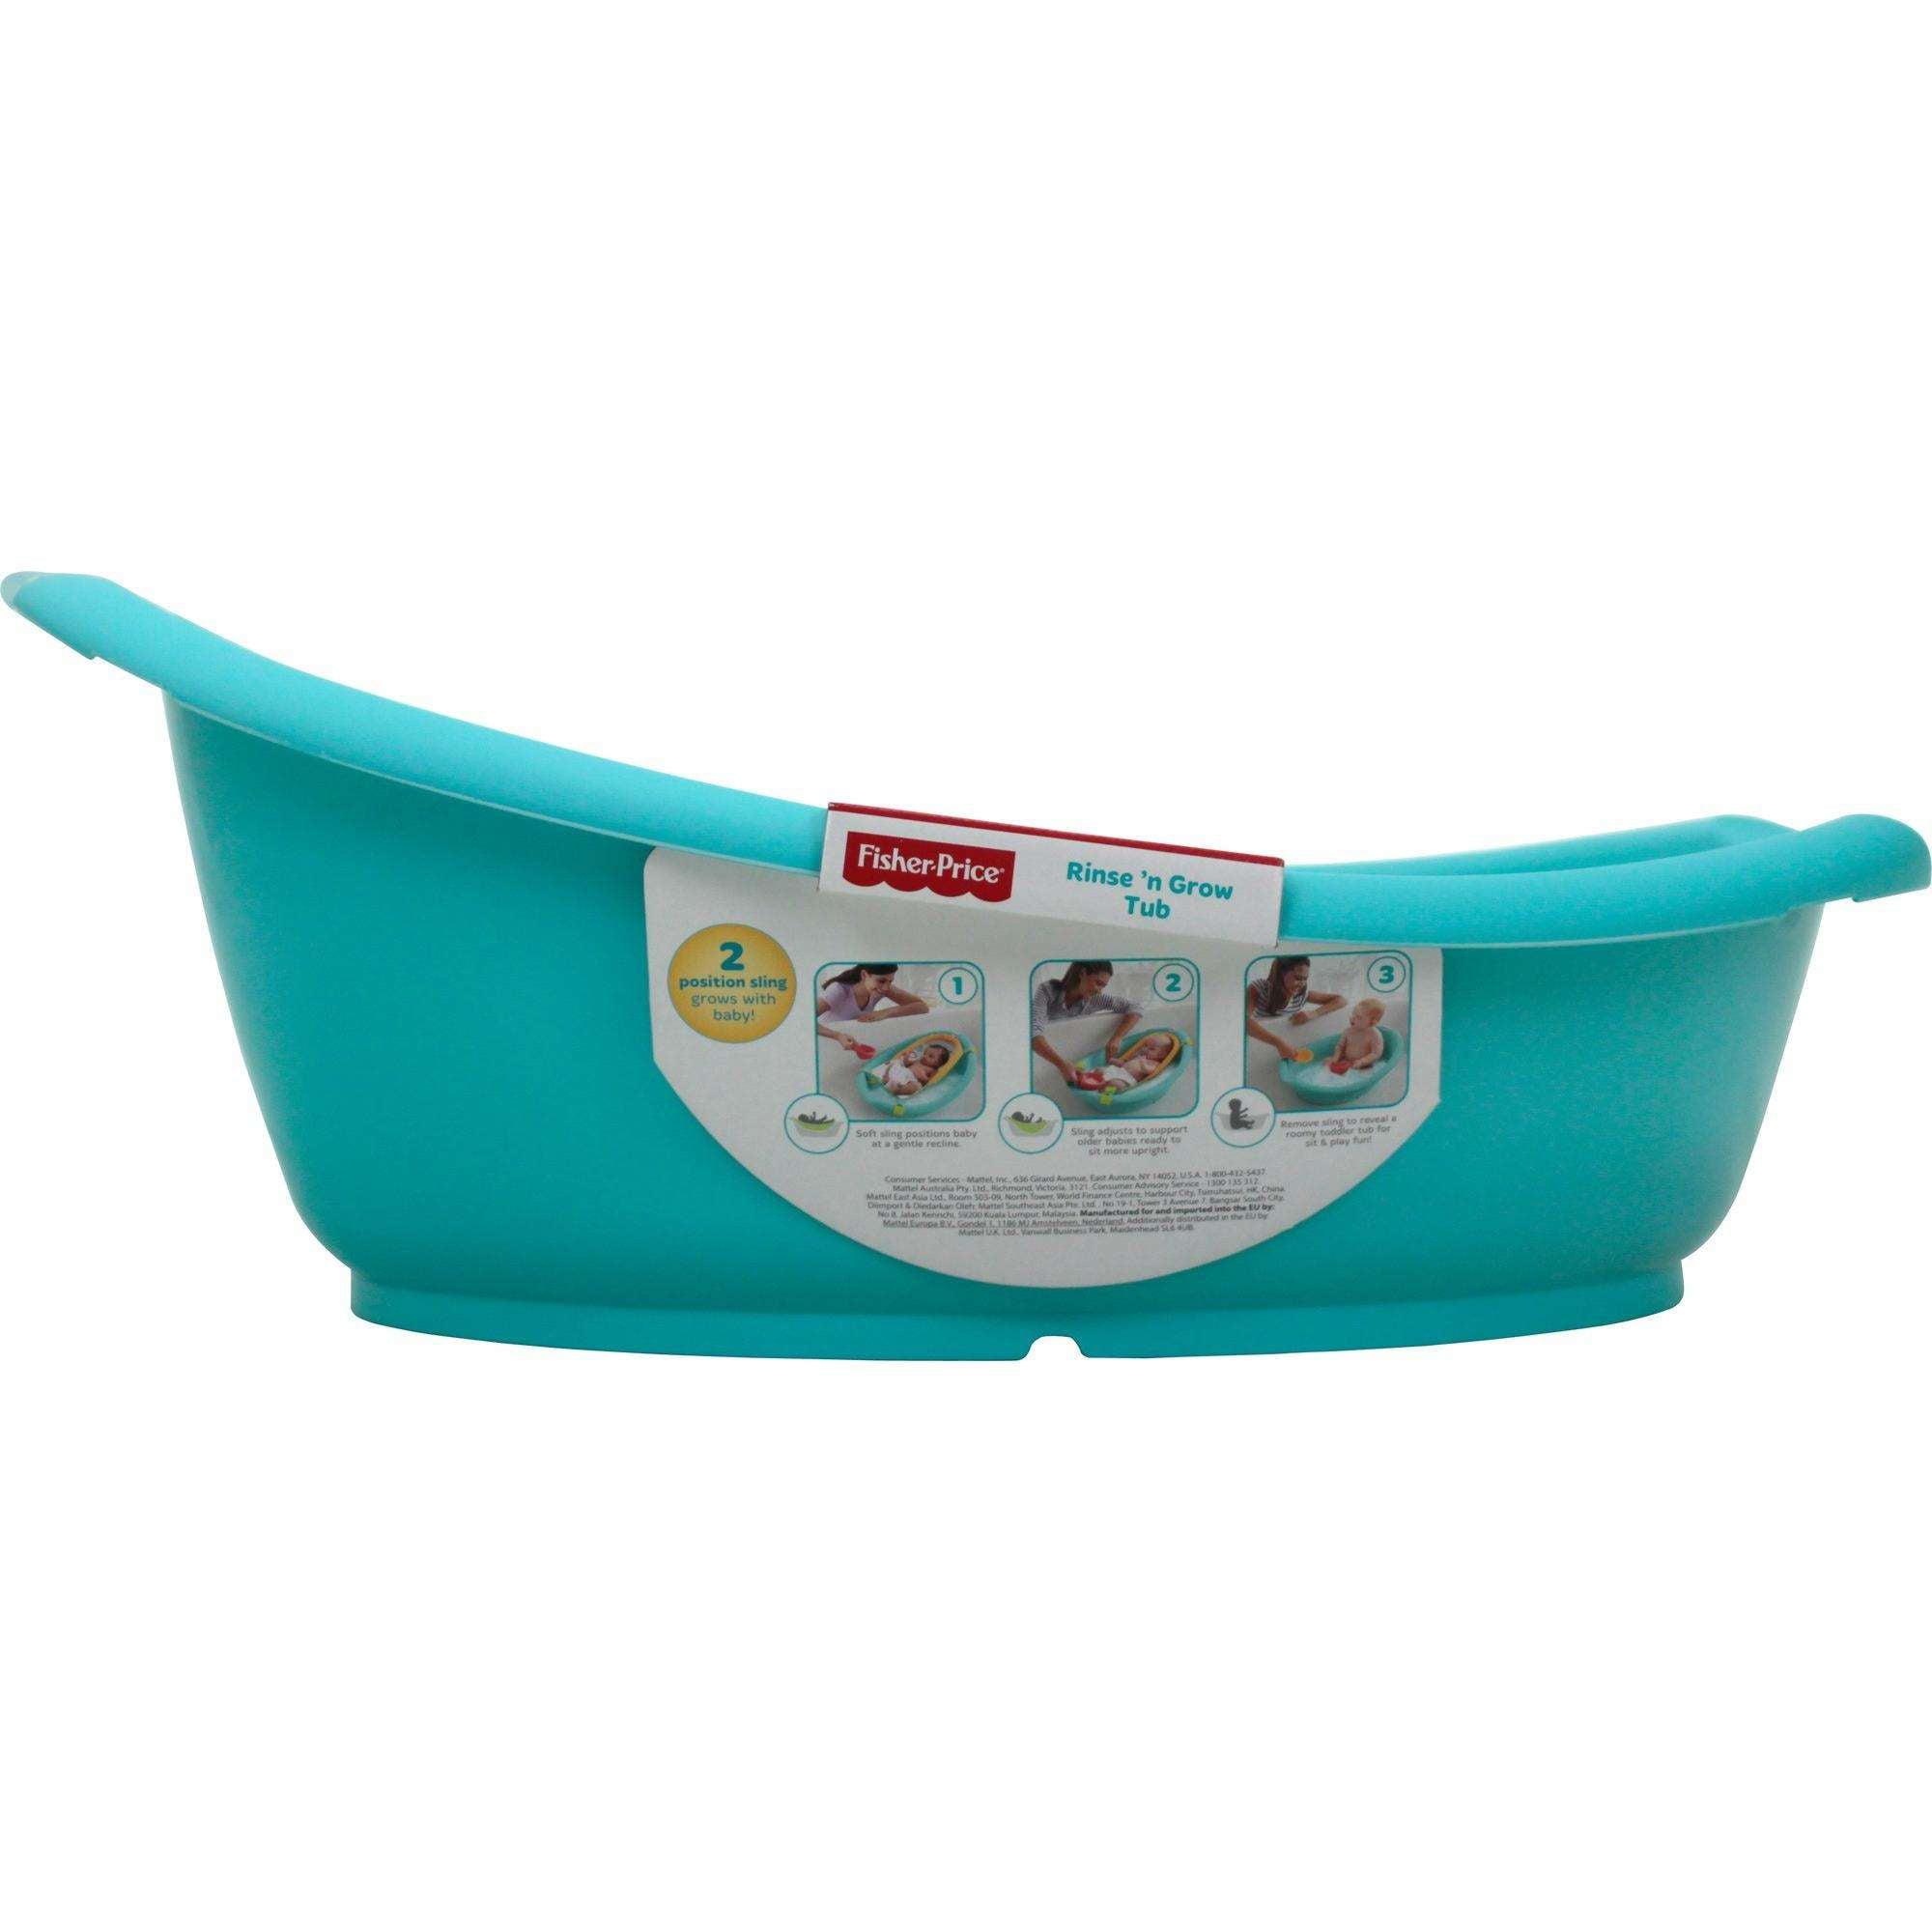 Fisher-Price Rinse \'n Grow Tub - Walmart.com